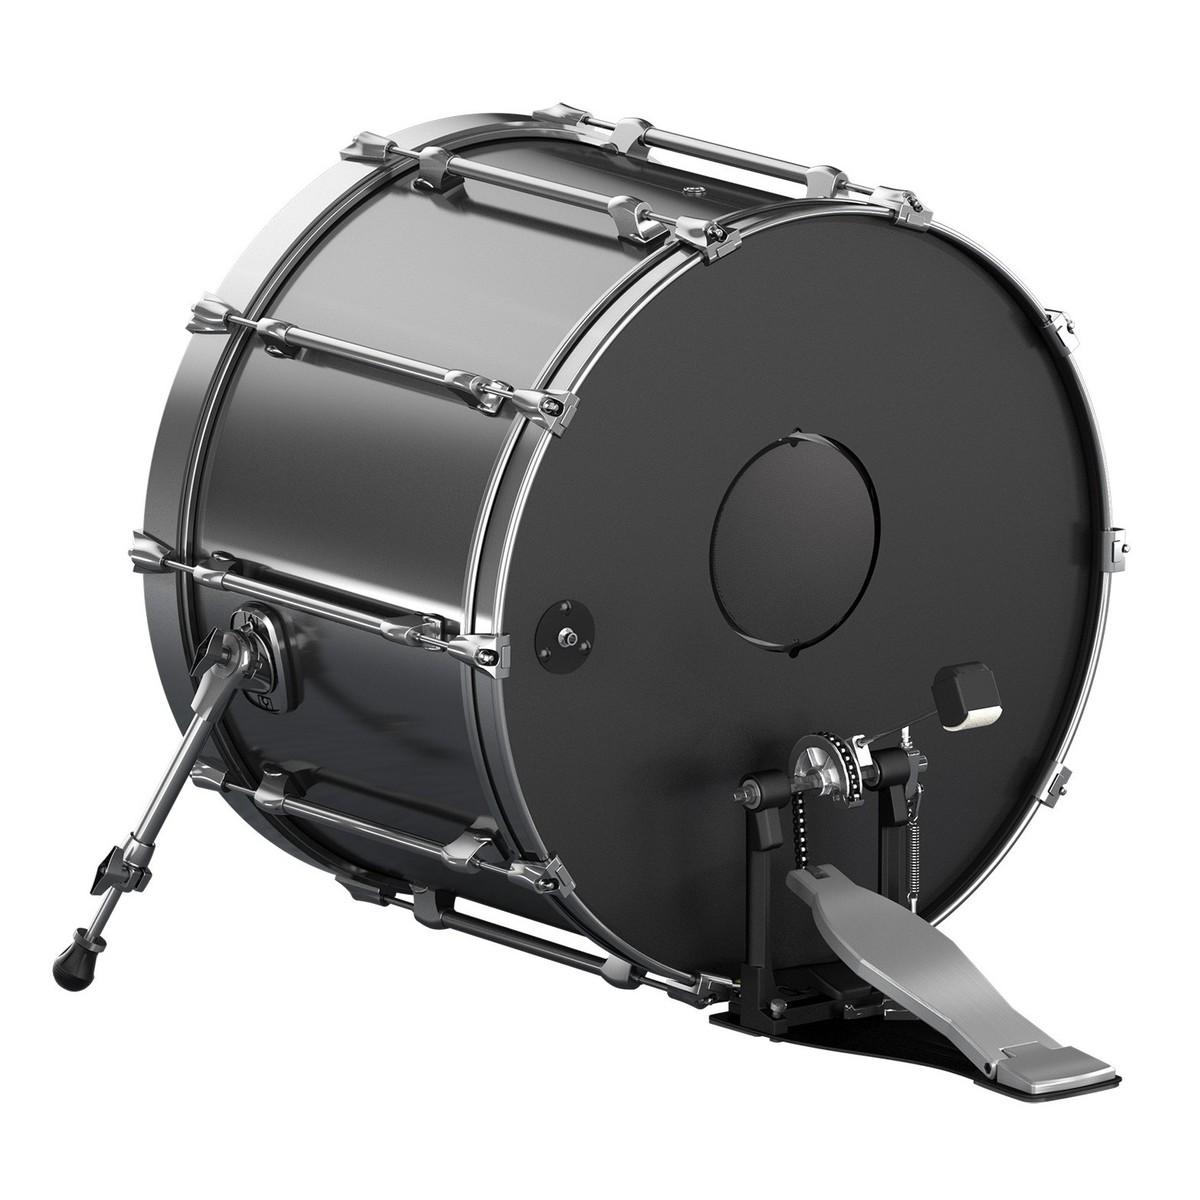 e83348eae45c Roland KD-A22 V-Drums Kick Drum Converter Pad at Gear4music